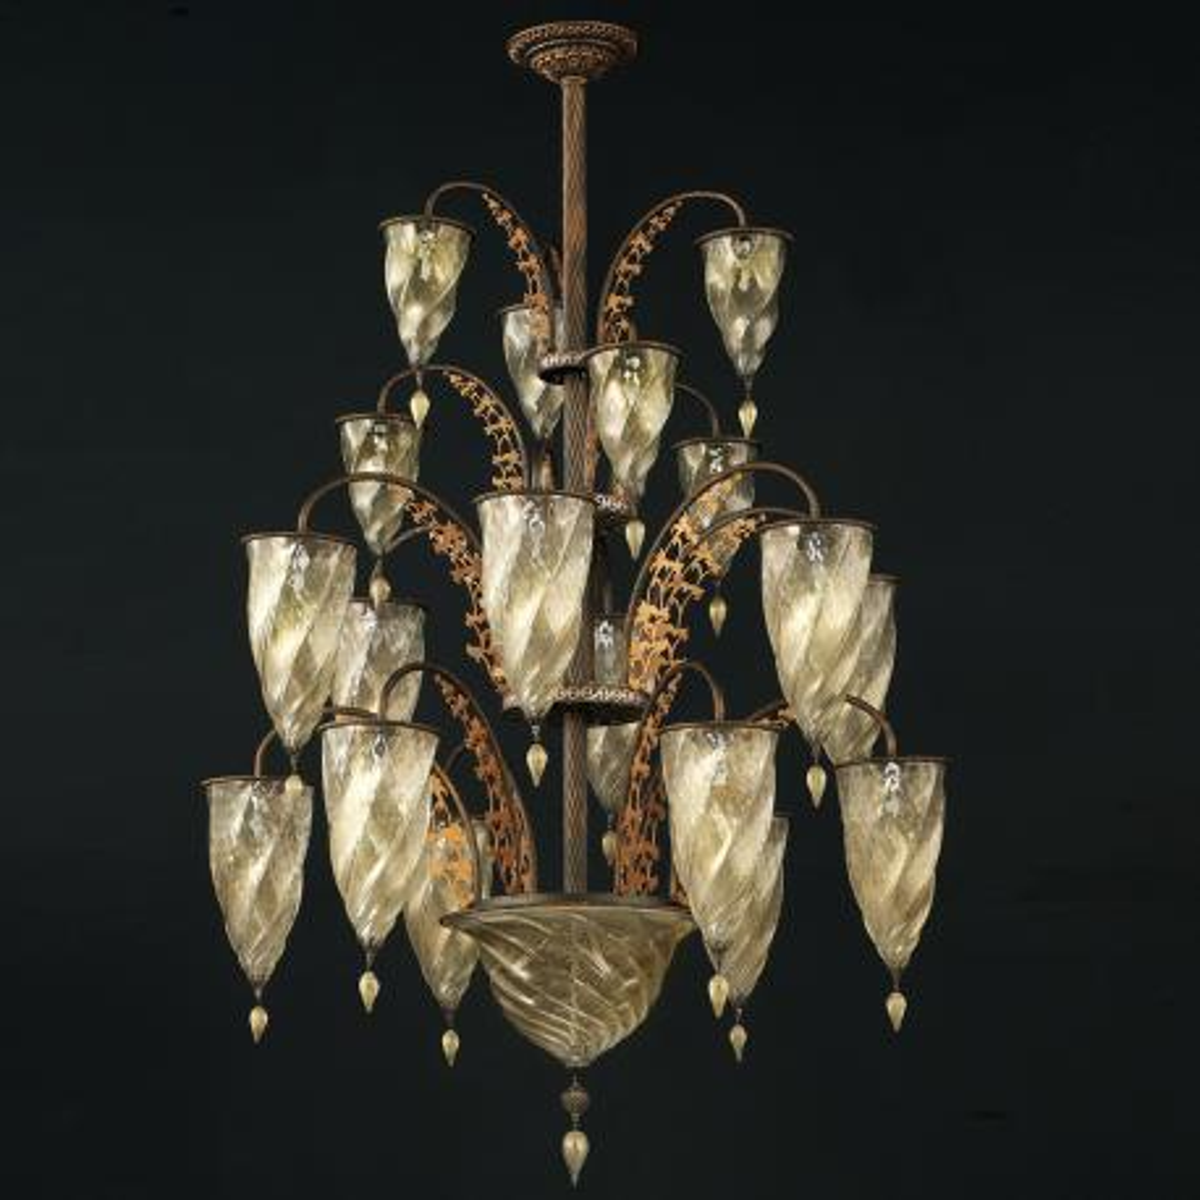 """Alessandria"" Murano glas Kronleuchter - 19 flammig - gold"